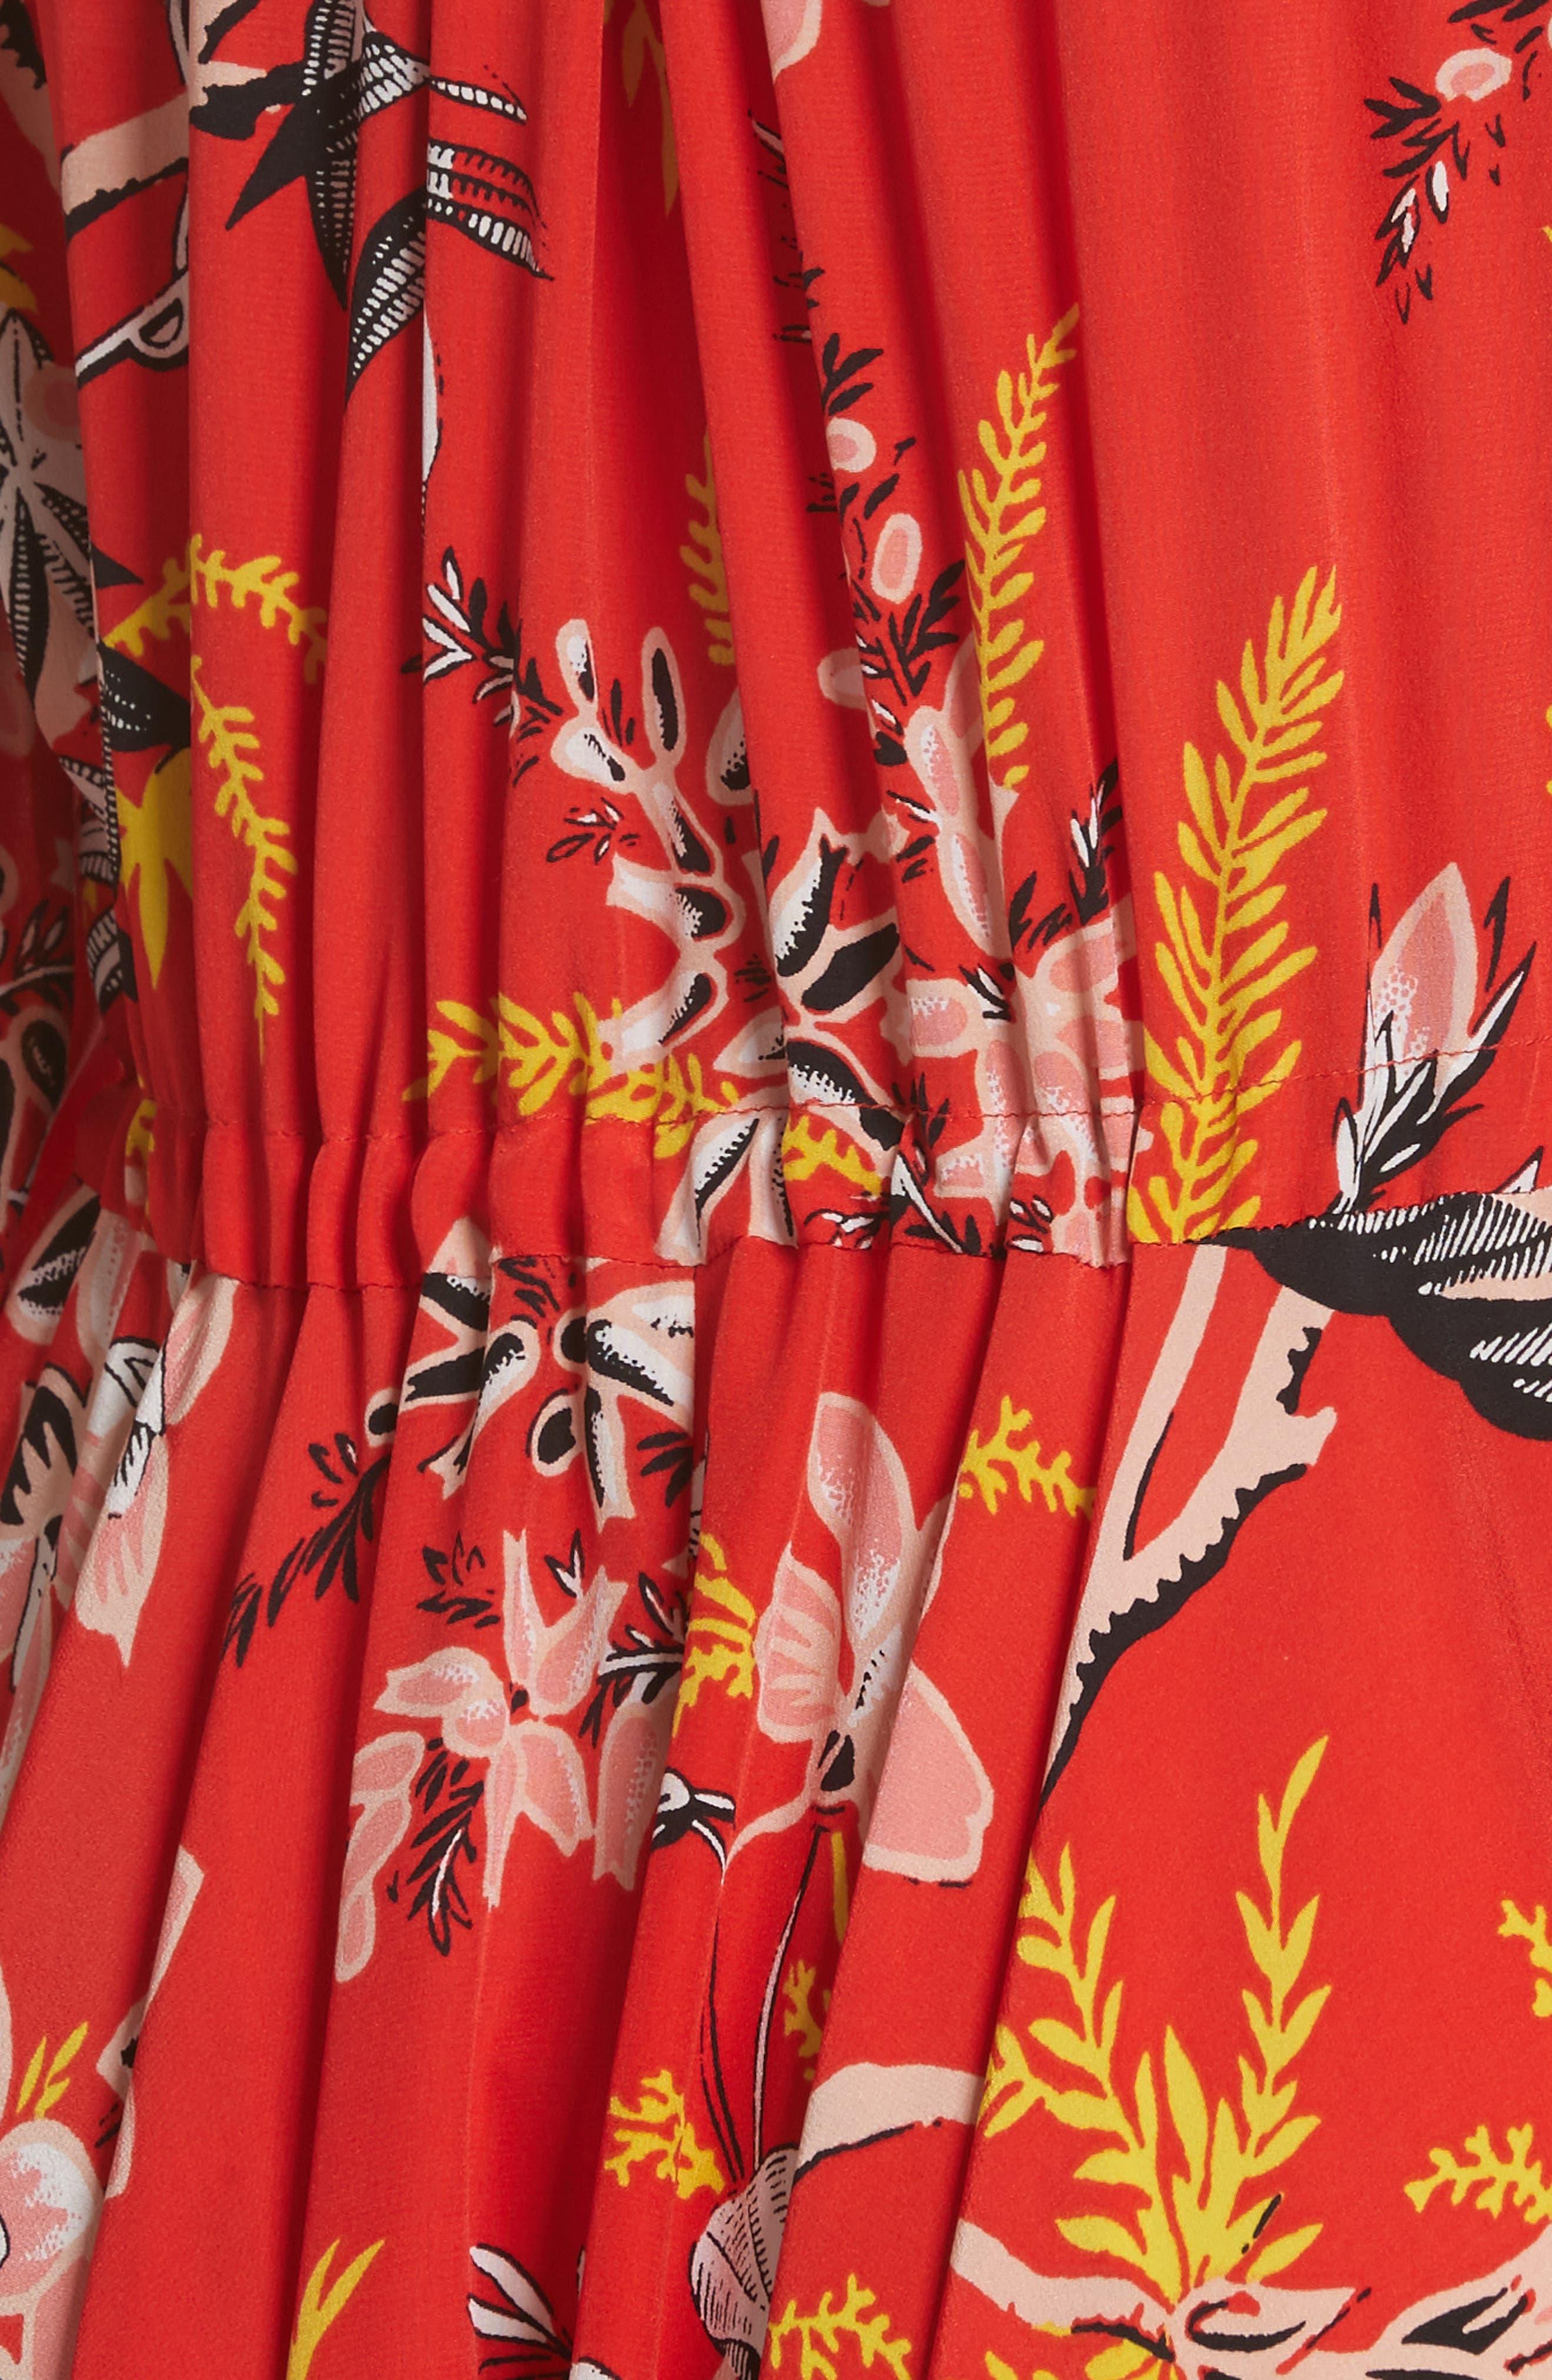 Diane von Furstenberg Floral Silk Maxi Dress,                             Alternate thumbnail 7, color,                             Avalon Poppy